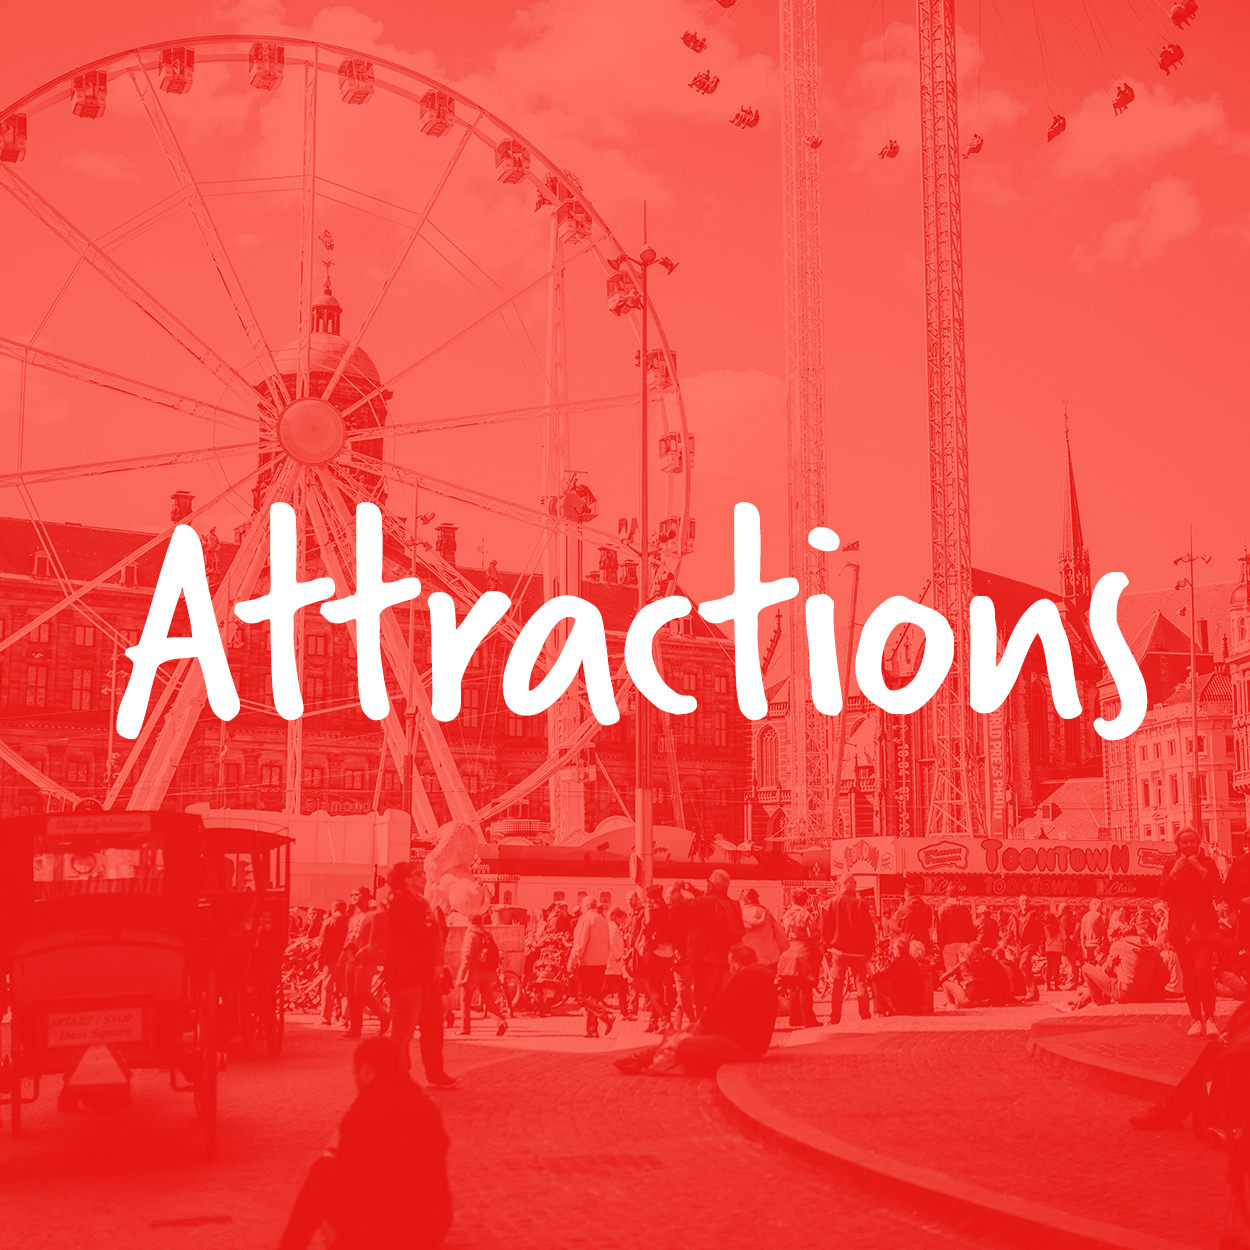 attractions.jpg